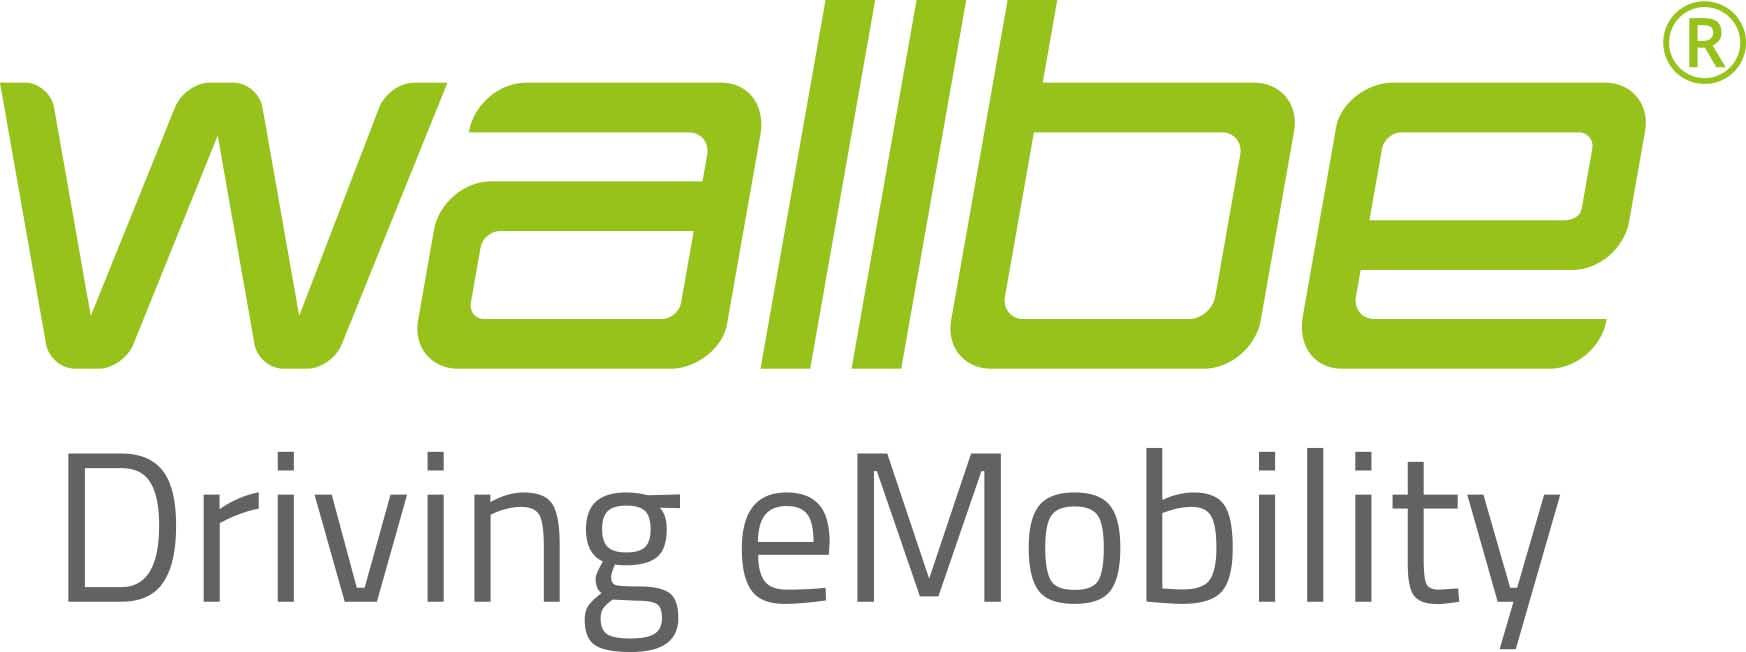 wallbe, Ladetechnik für Elektromobile